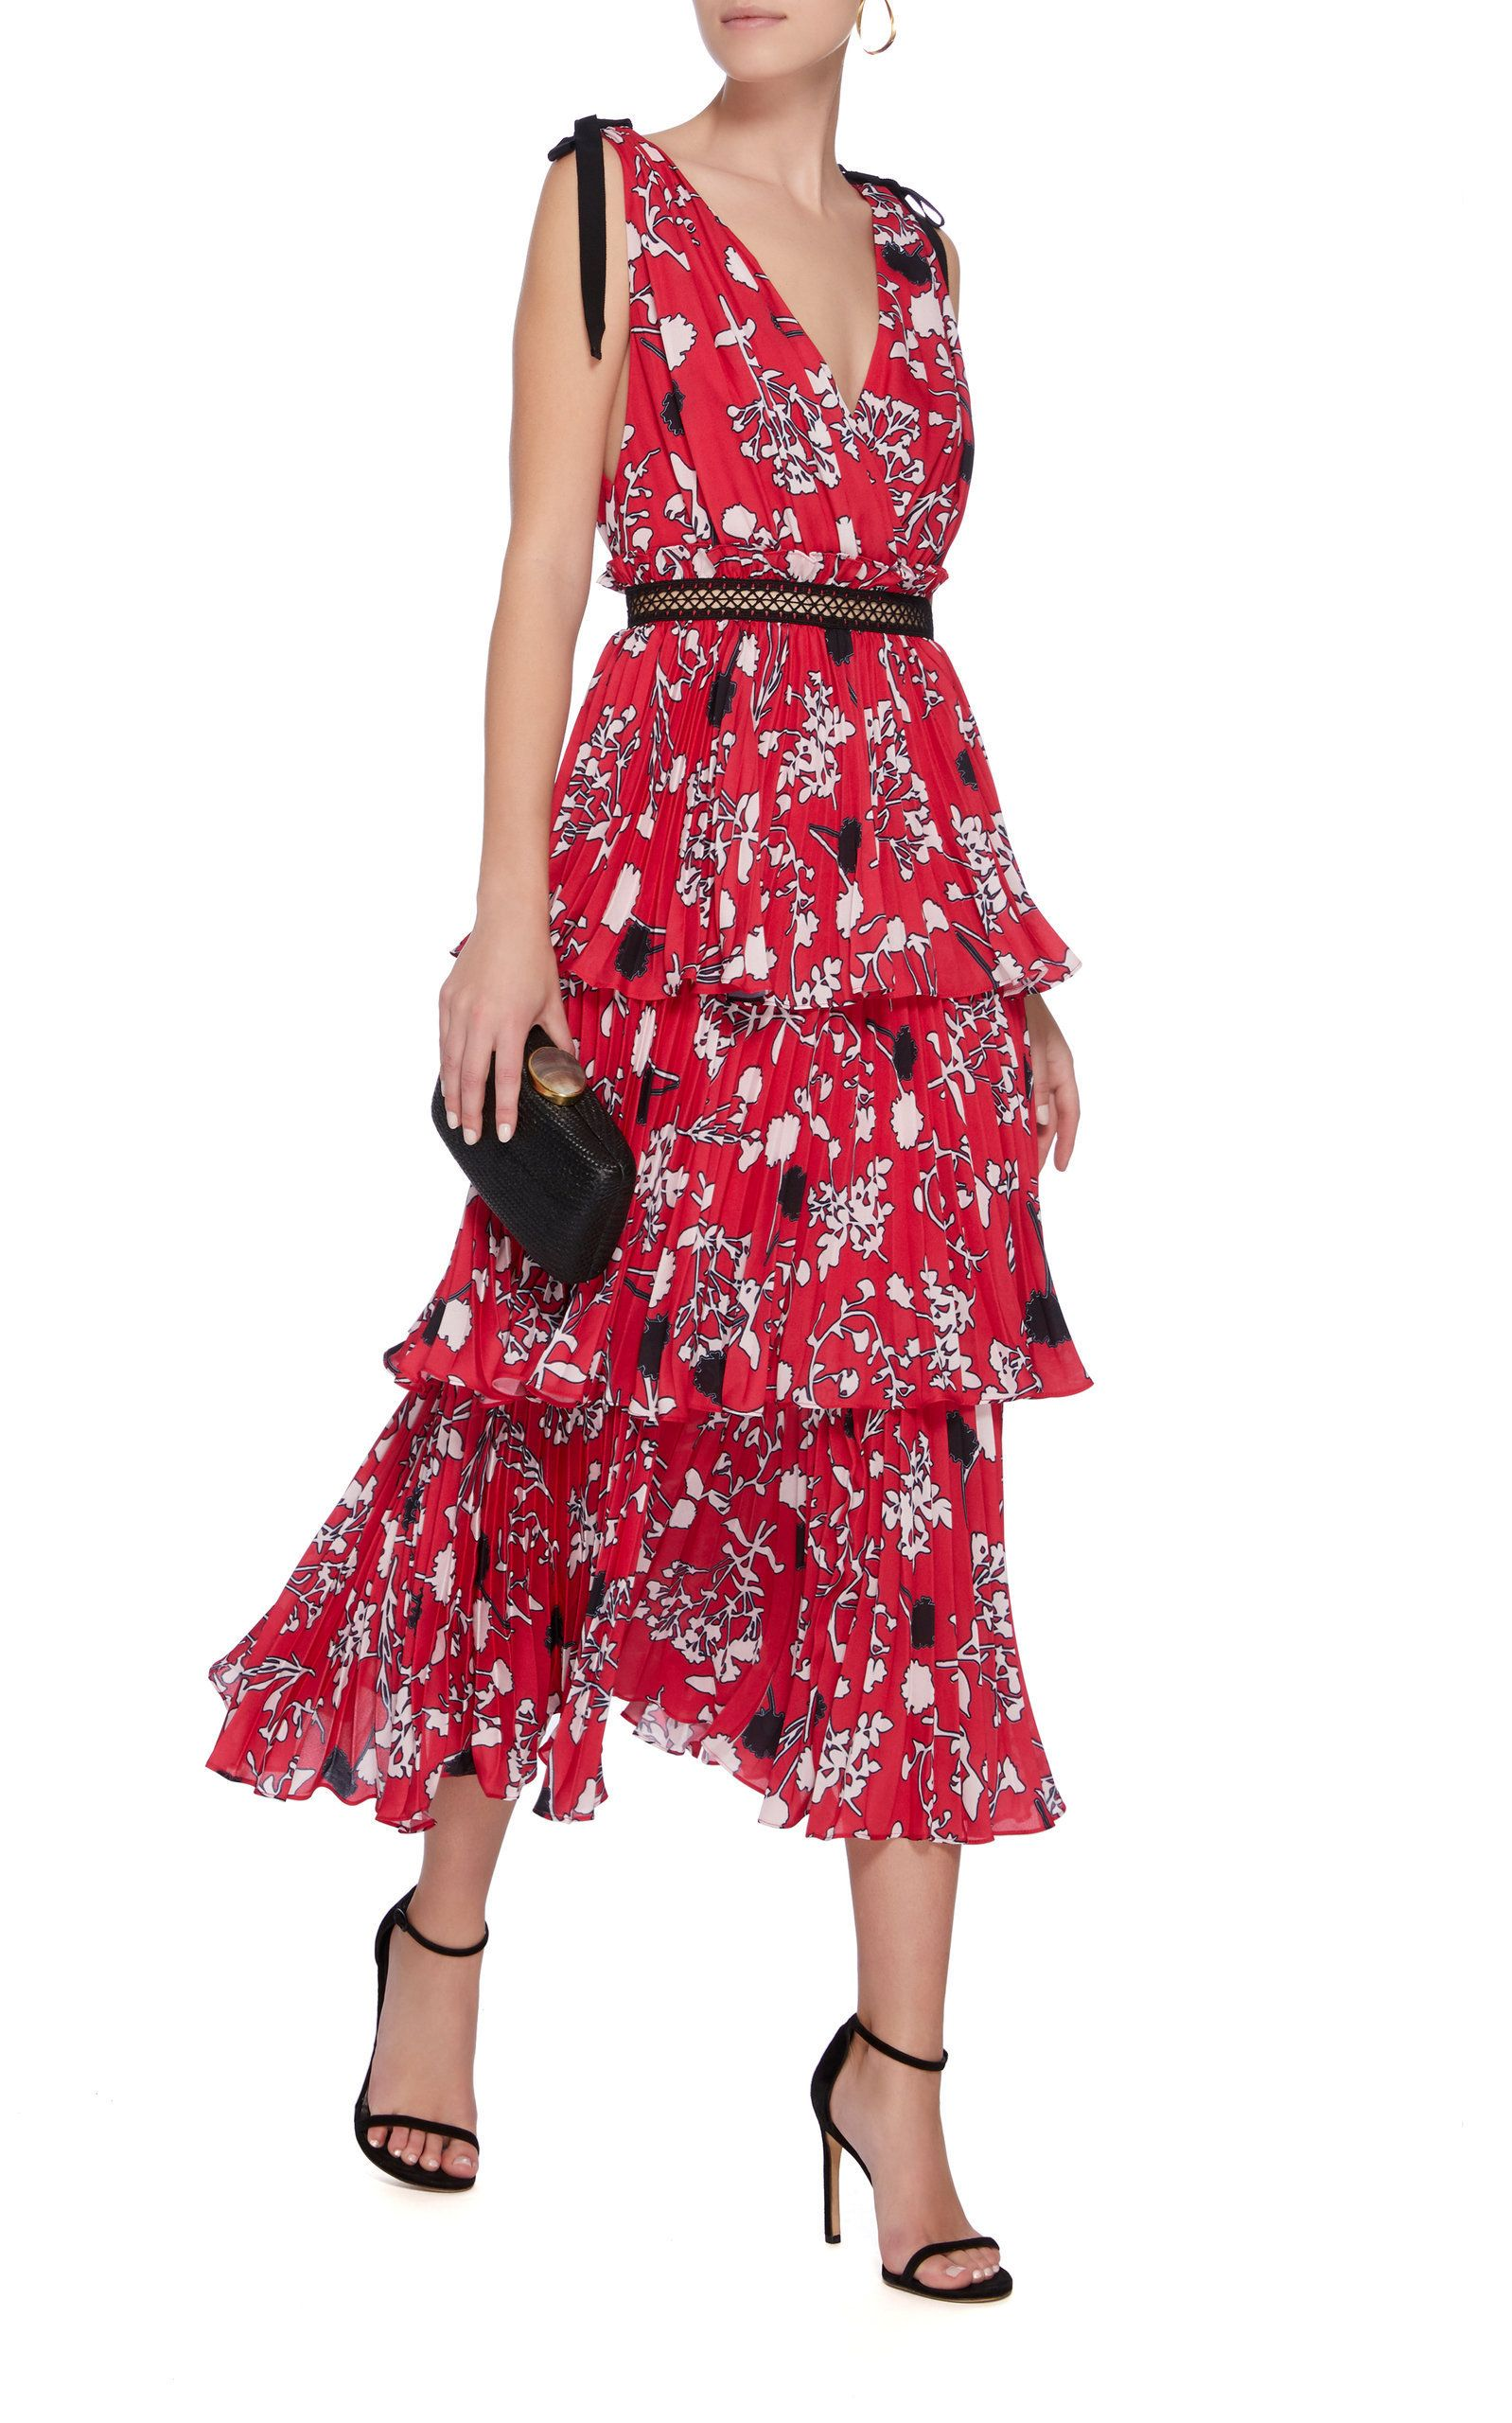 a31f7e8fdbc5 Tiered Floral Print Midi Dress by SELF PORTRAIT Now Available on Moda  Operandi